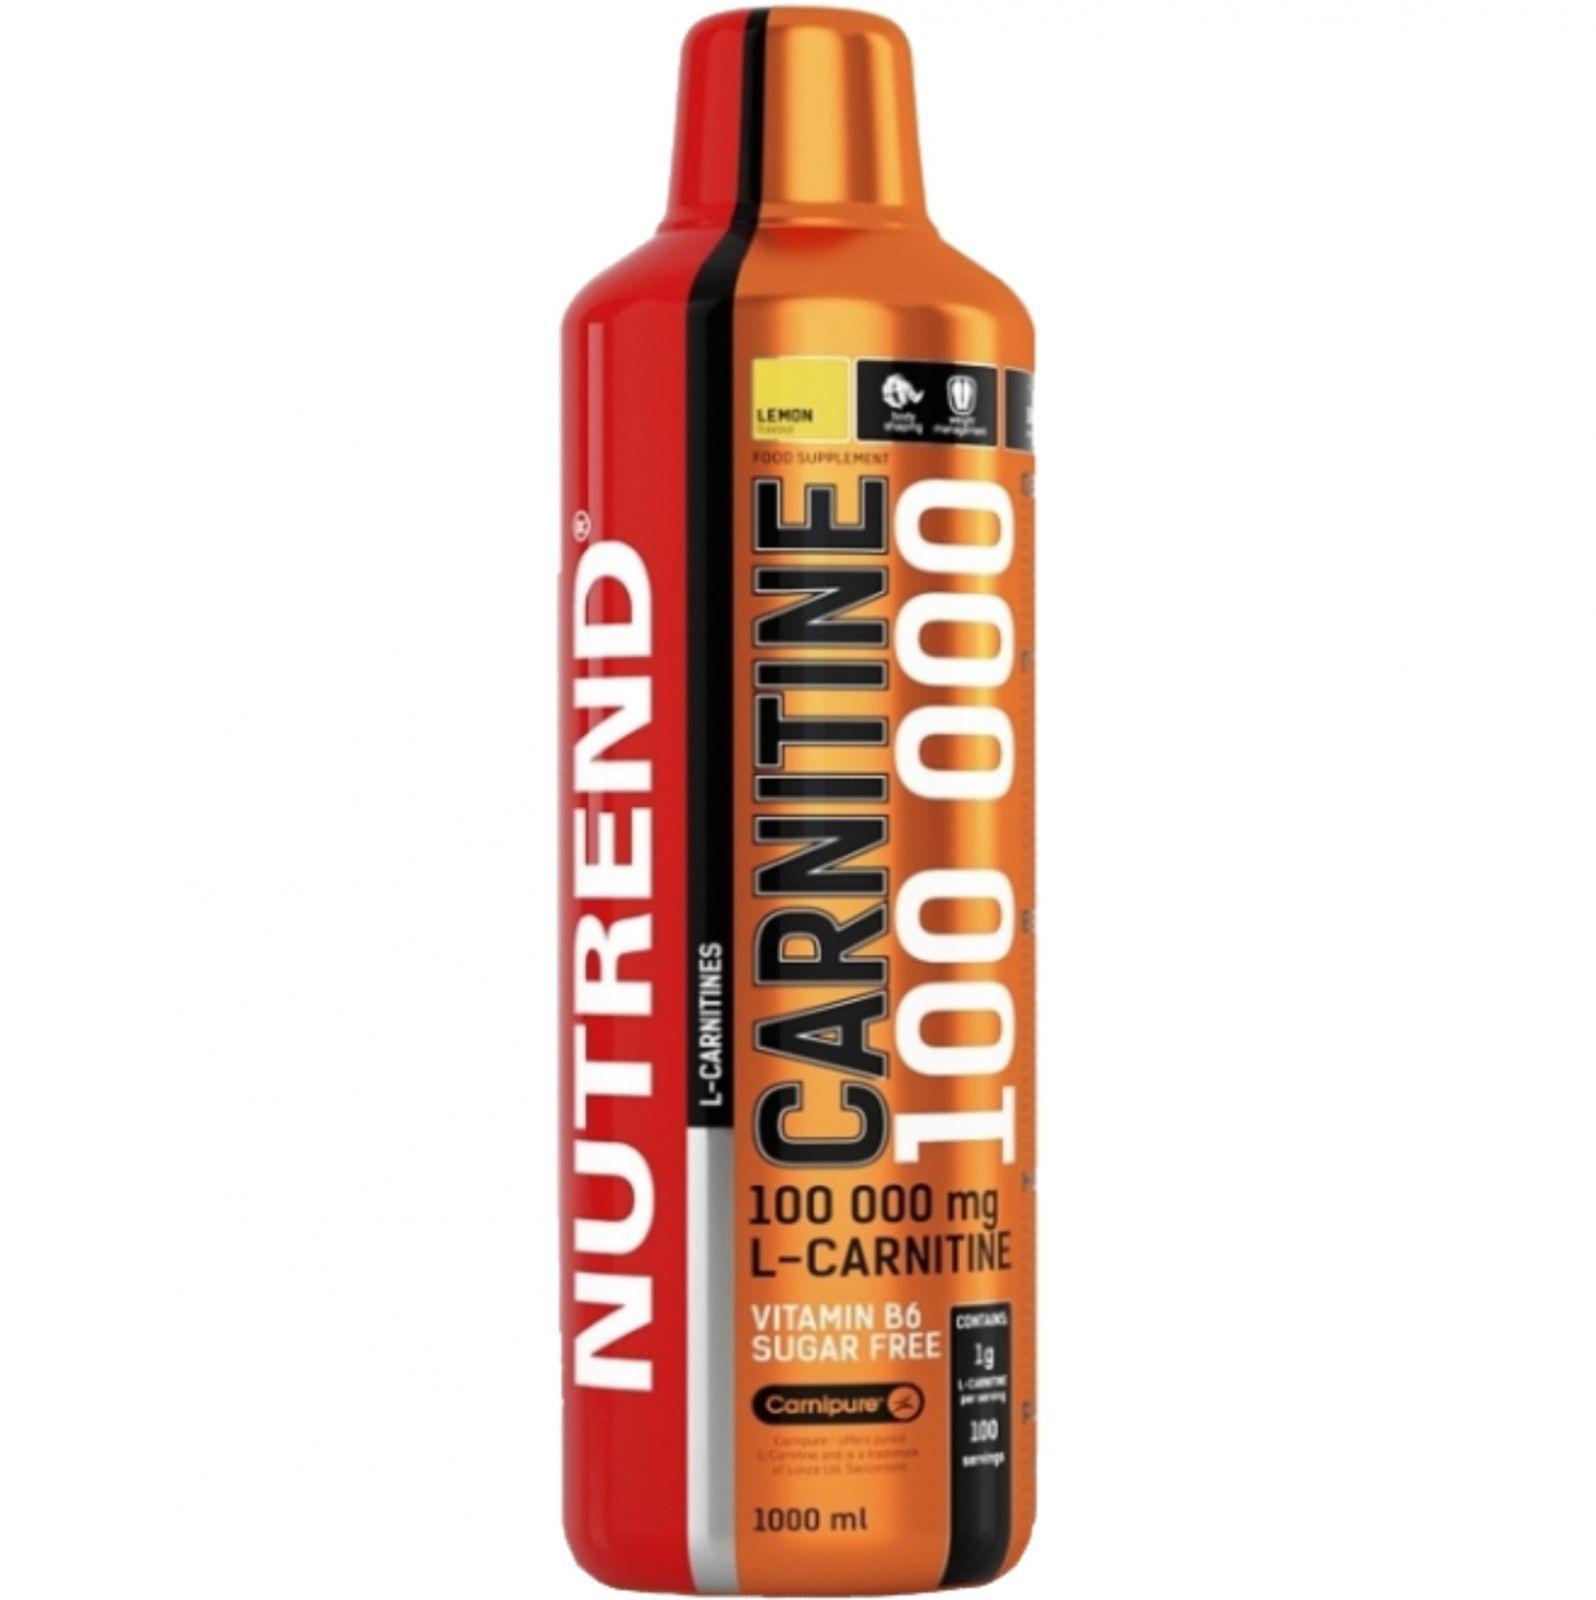 NUTREND Carnitine 100 000 - 1000ml